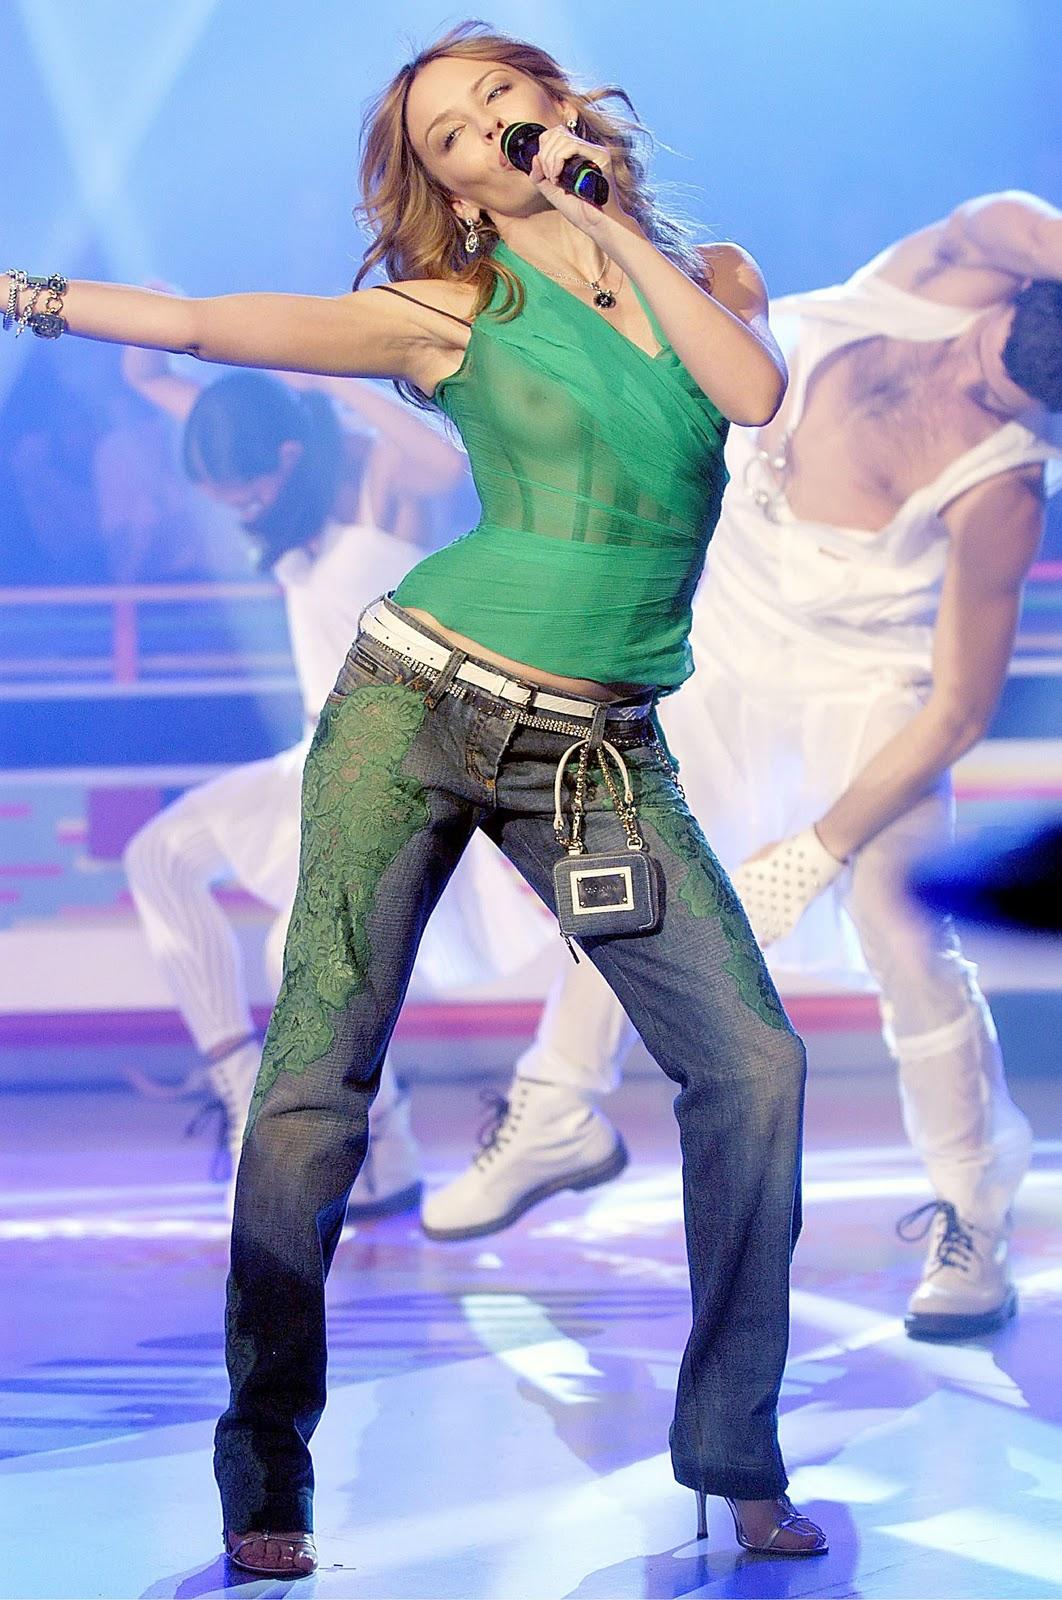 http://3.bp.blogspot.com/-y0WP9ZnwAk4/TVXib2lZryI/AAAAAAAAAMA/AekgeThjV88/s1600/Kylie+Minogue+See-Through+Boobie+Revealing+Green+Top+www.GutterUncensored.com+005.jpg